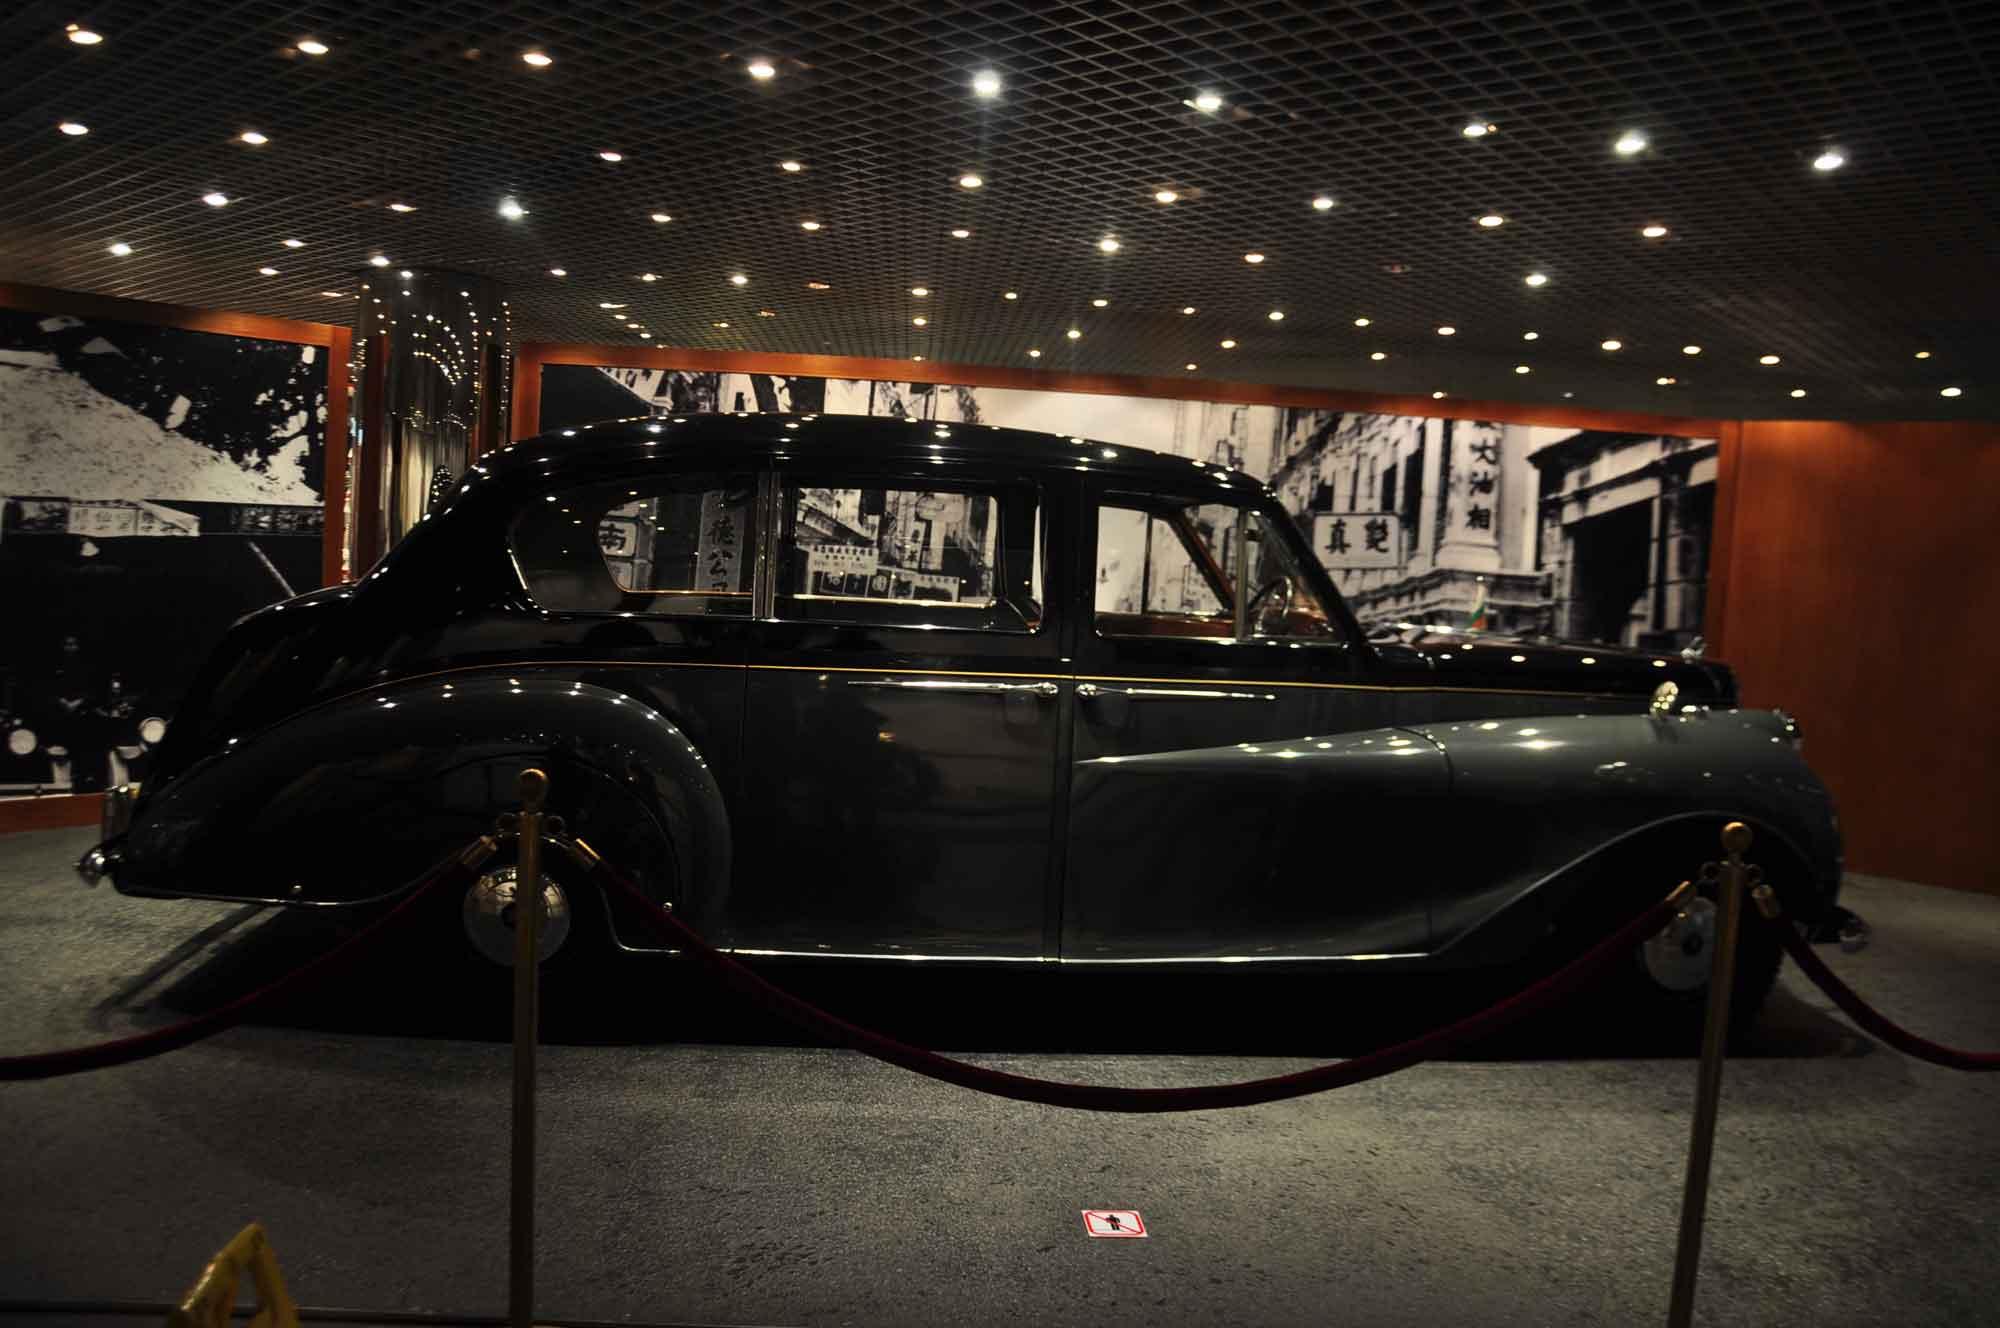 Grand Prix Museum hearse type vehicle